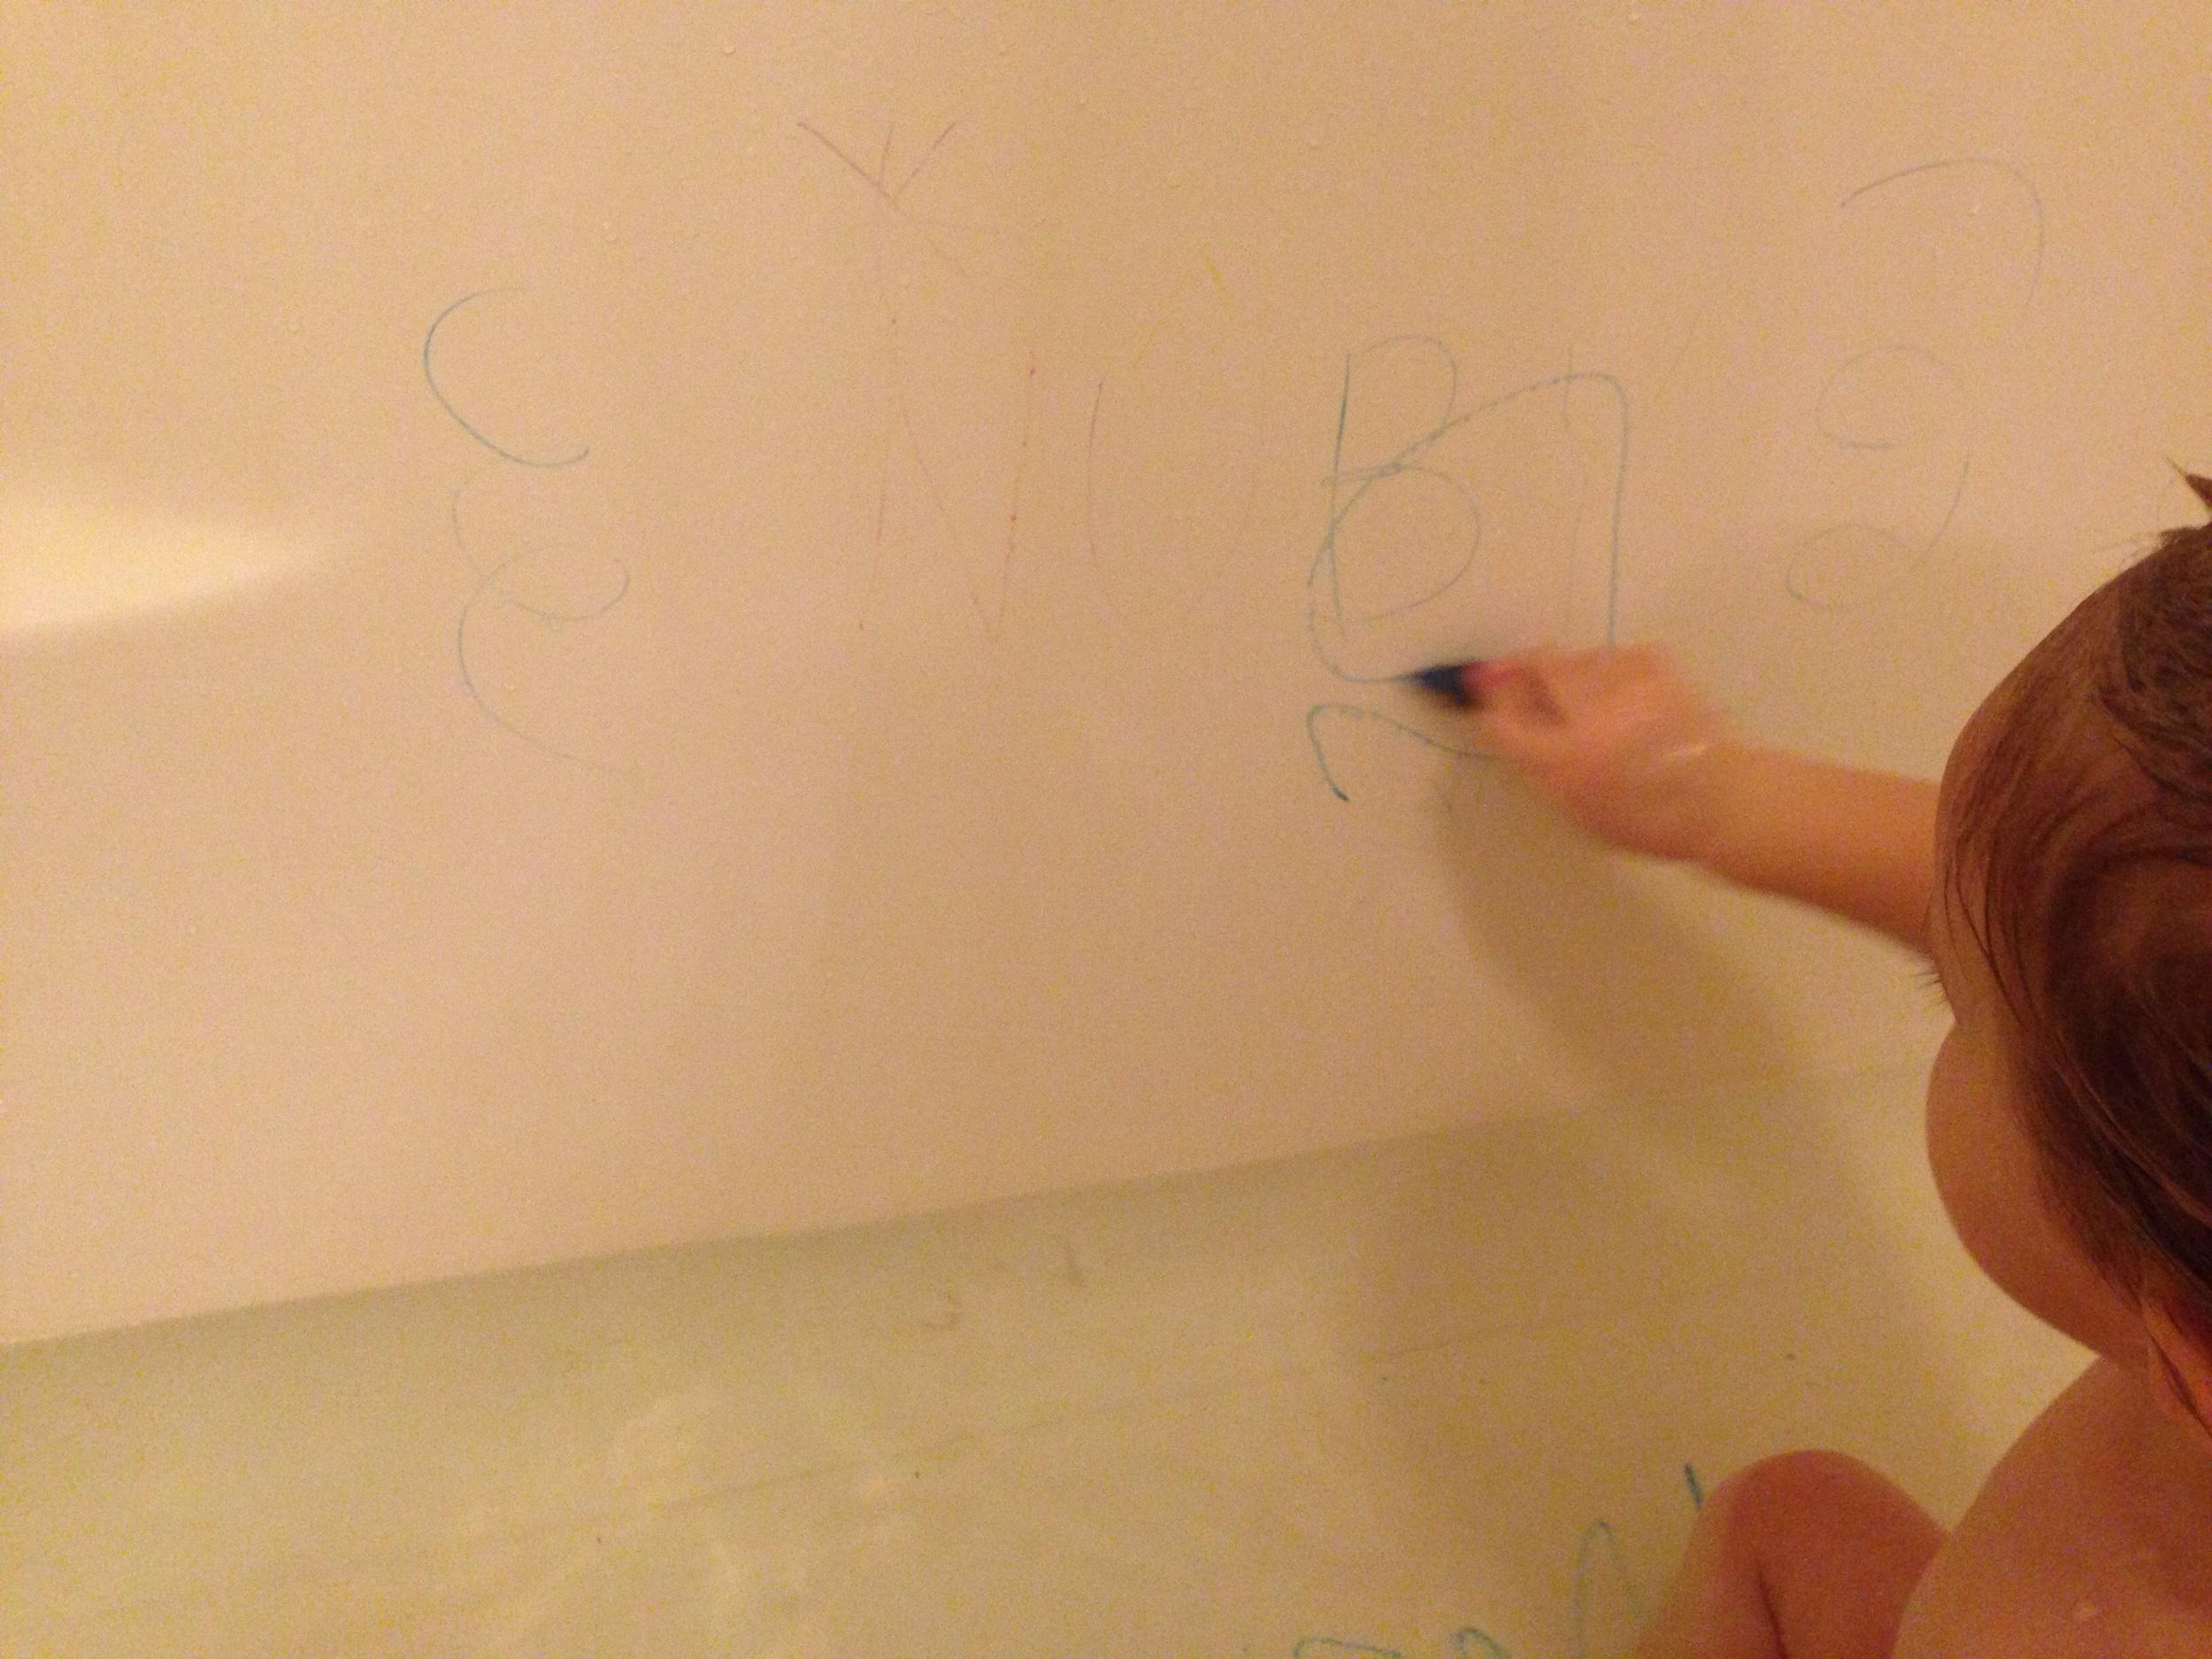 Nuby bath crayons - lots of fun!